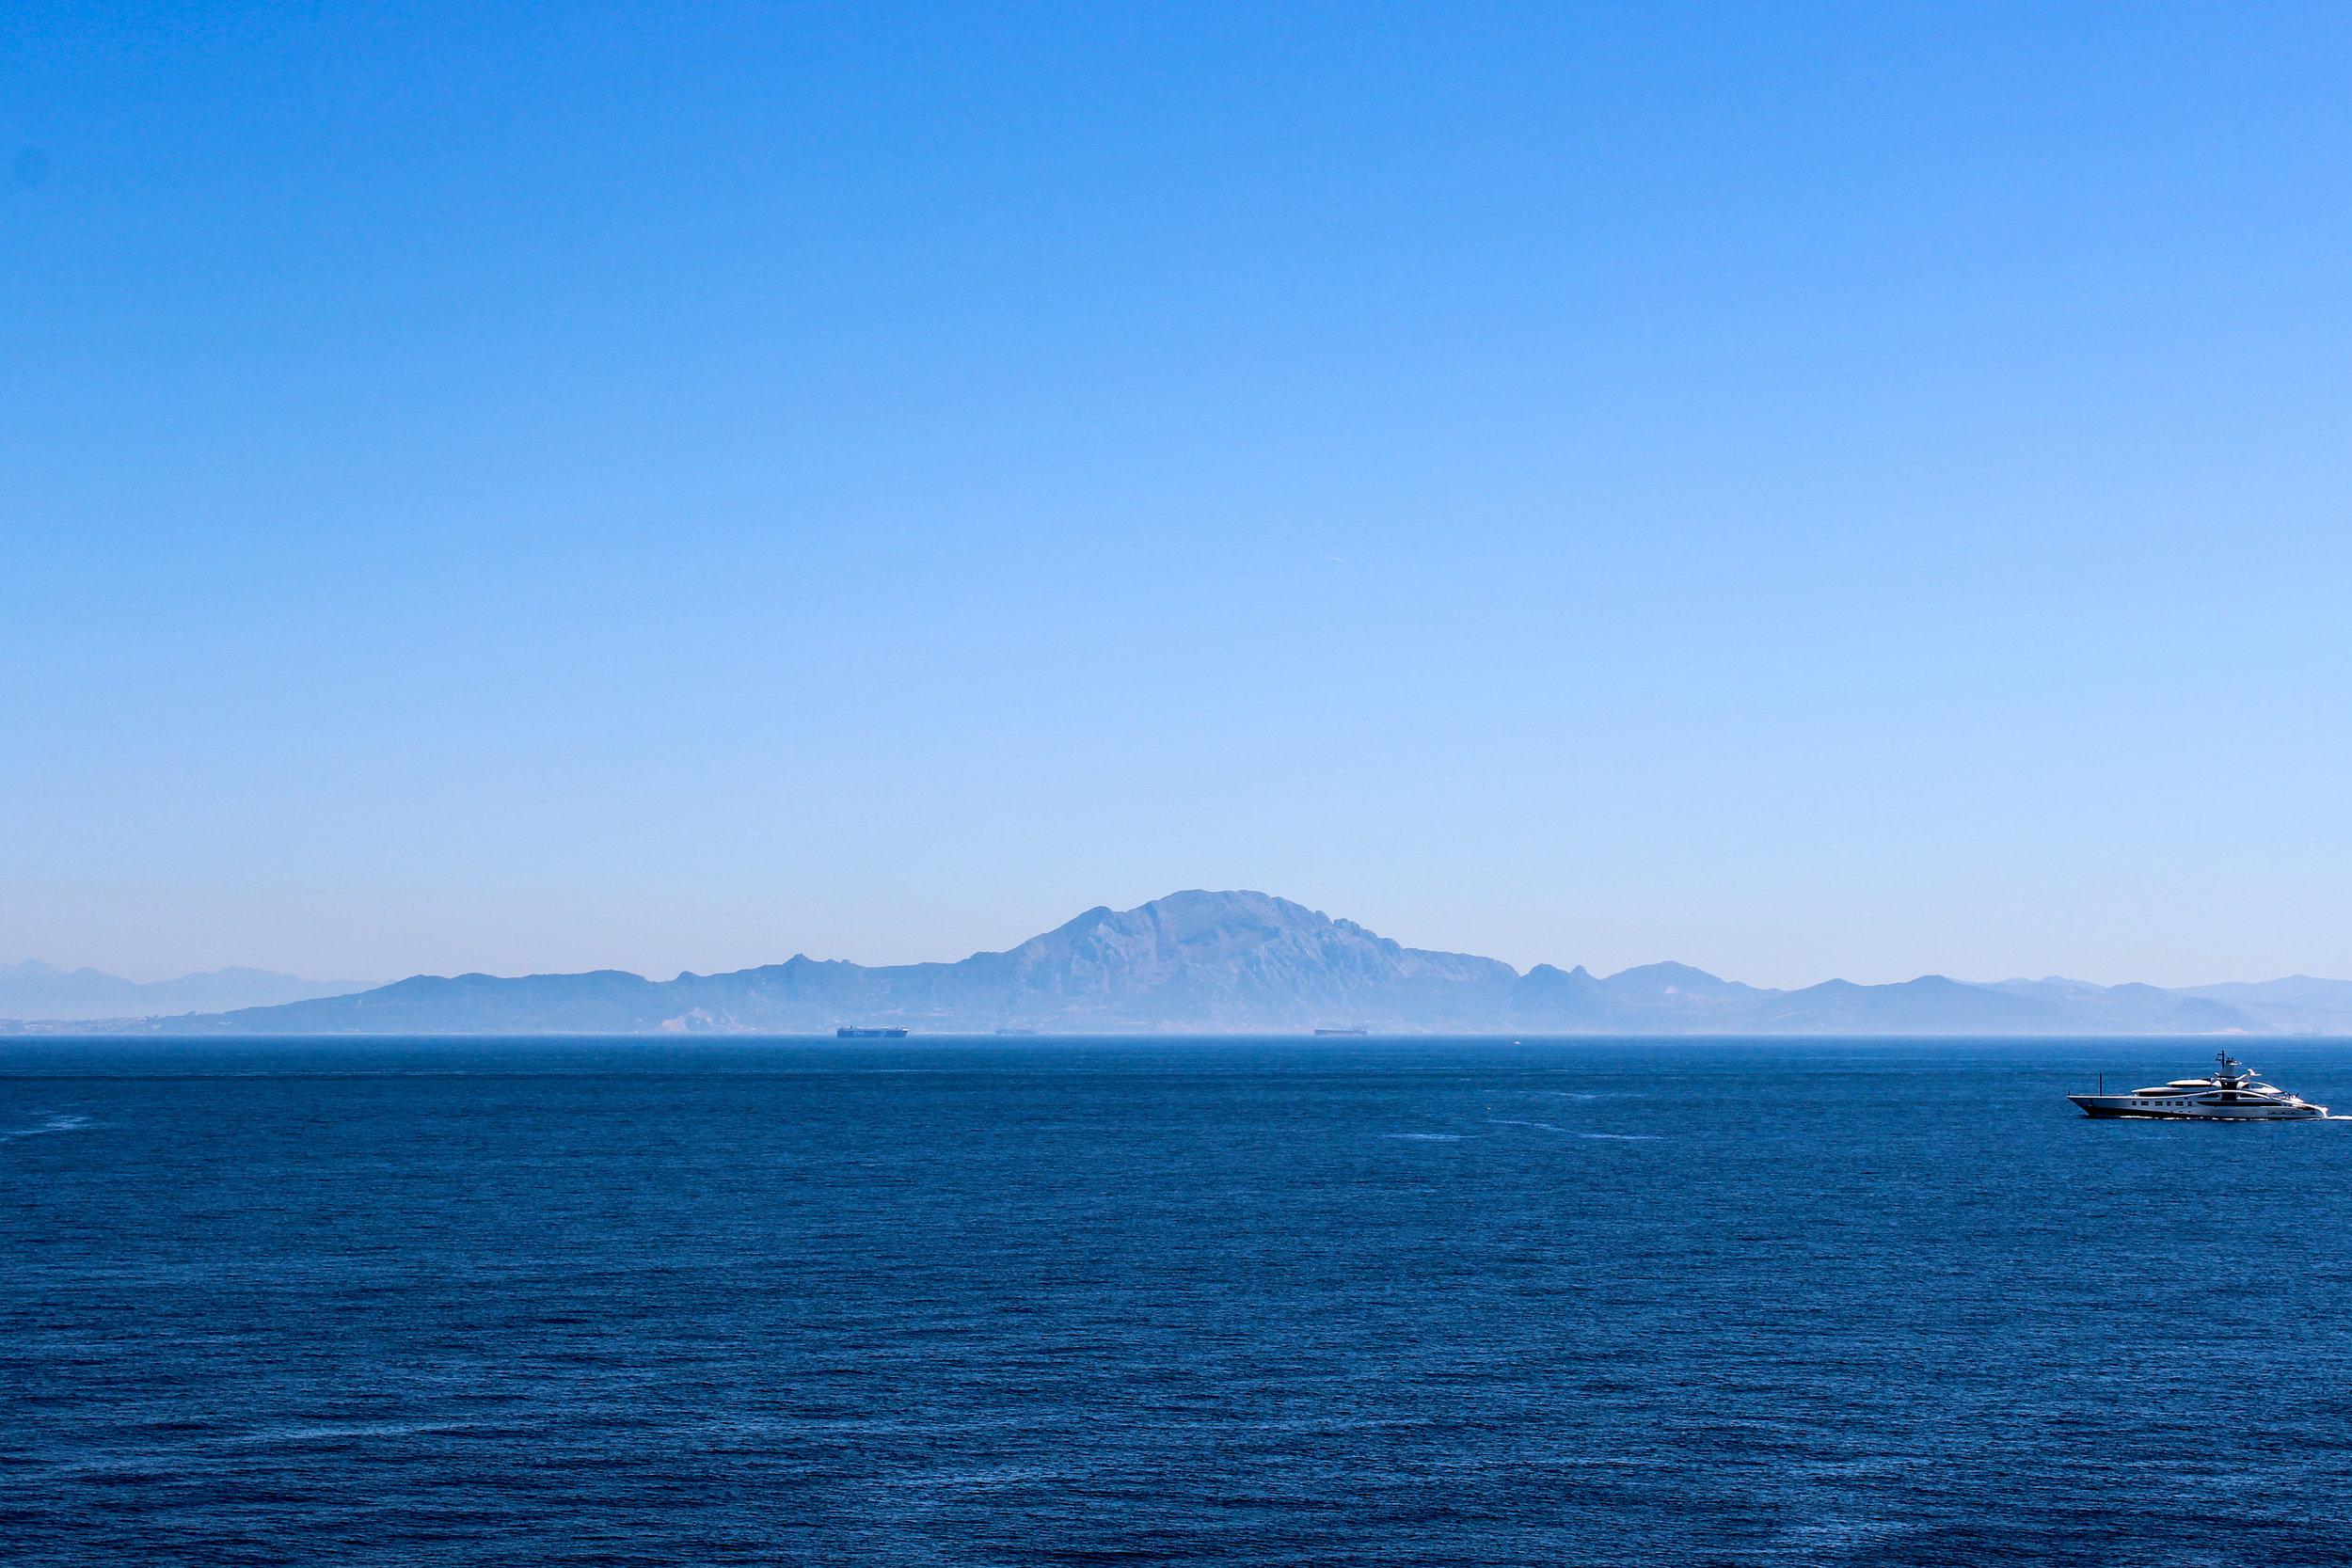 Morocco, Africa, Strait of Gibraltar, Europa Point, Mediterranean Sea, Gibraltar, British Overseas Territory, Europe  | www.DoLessGetMoreDone.com |